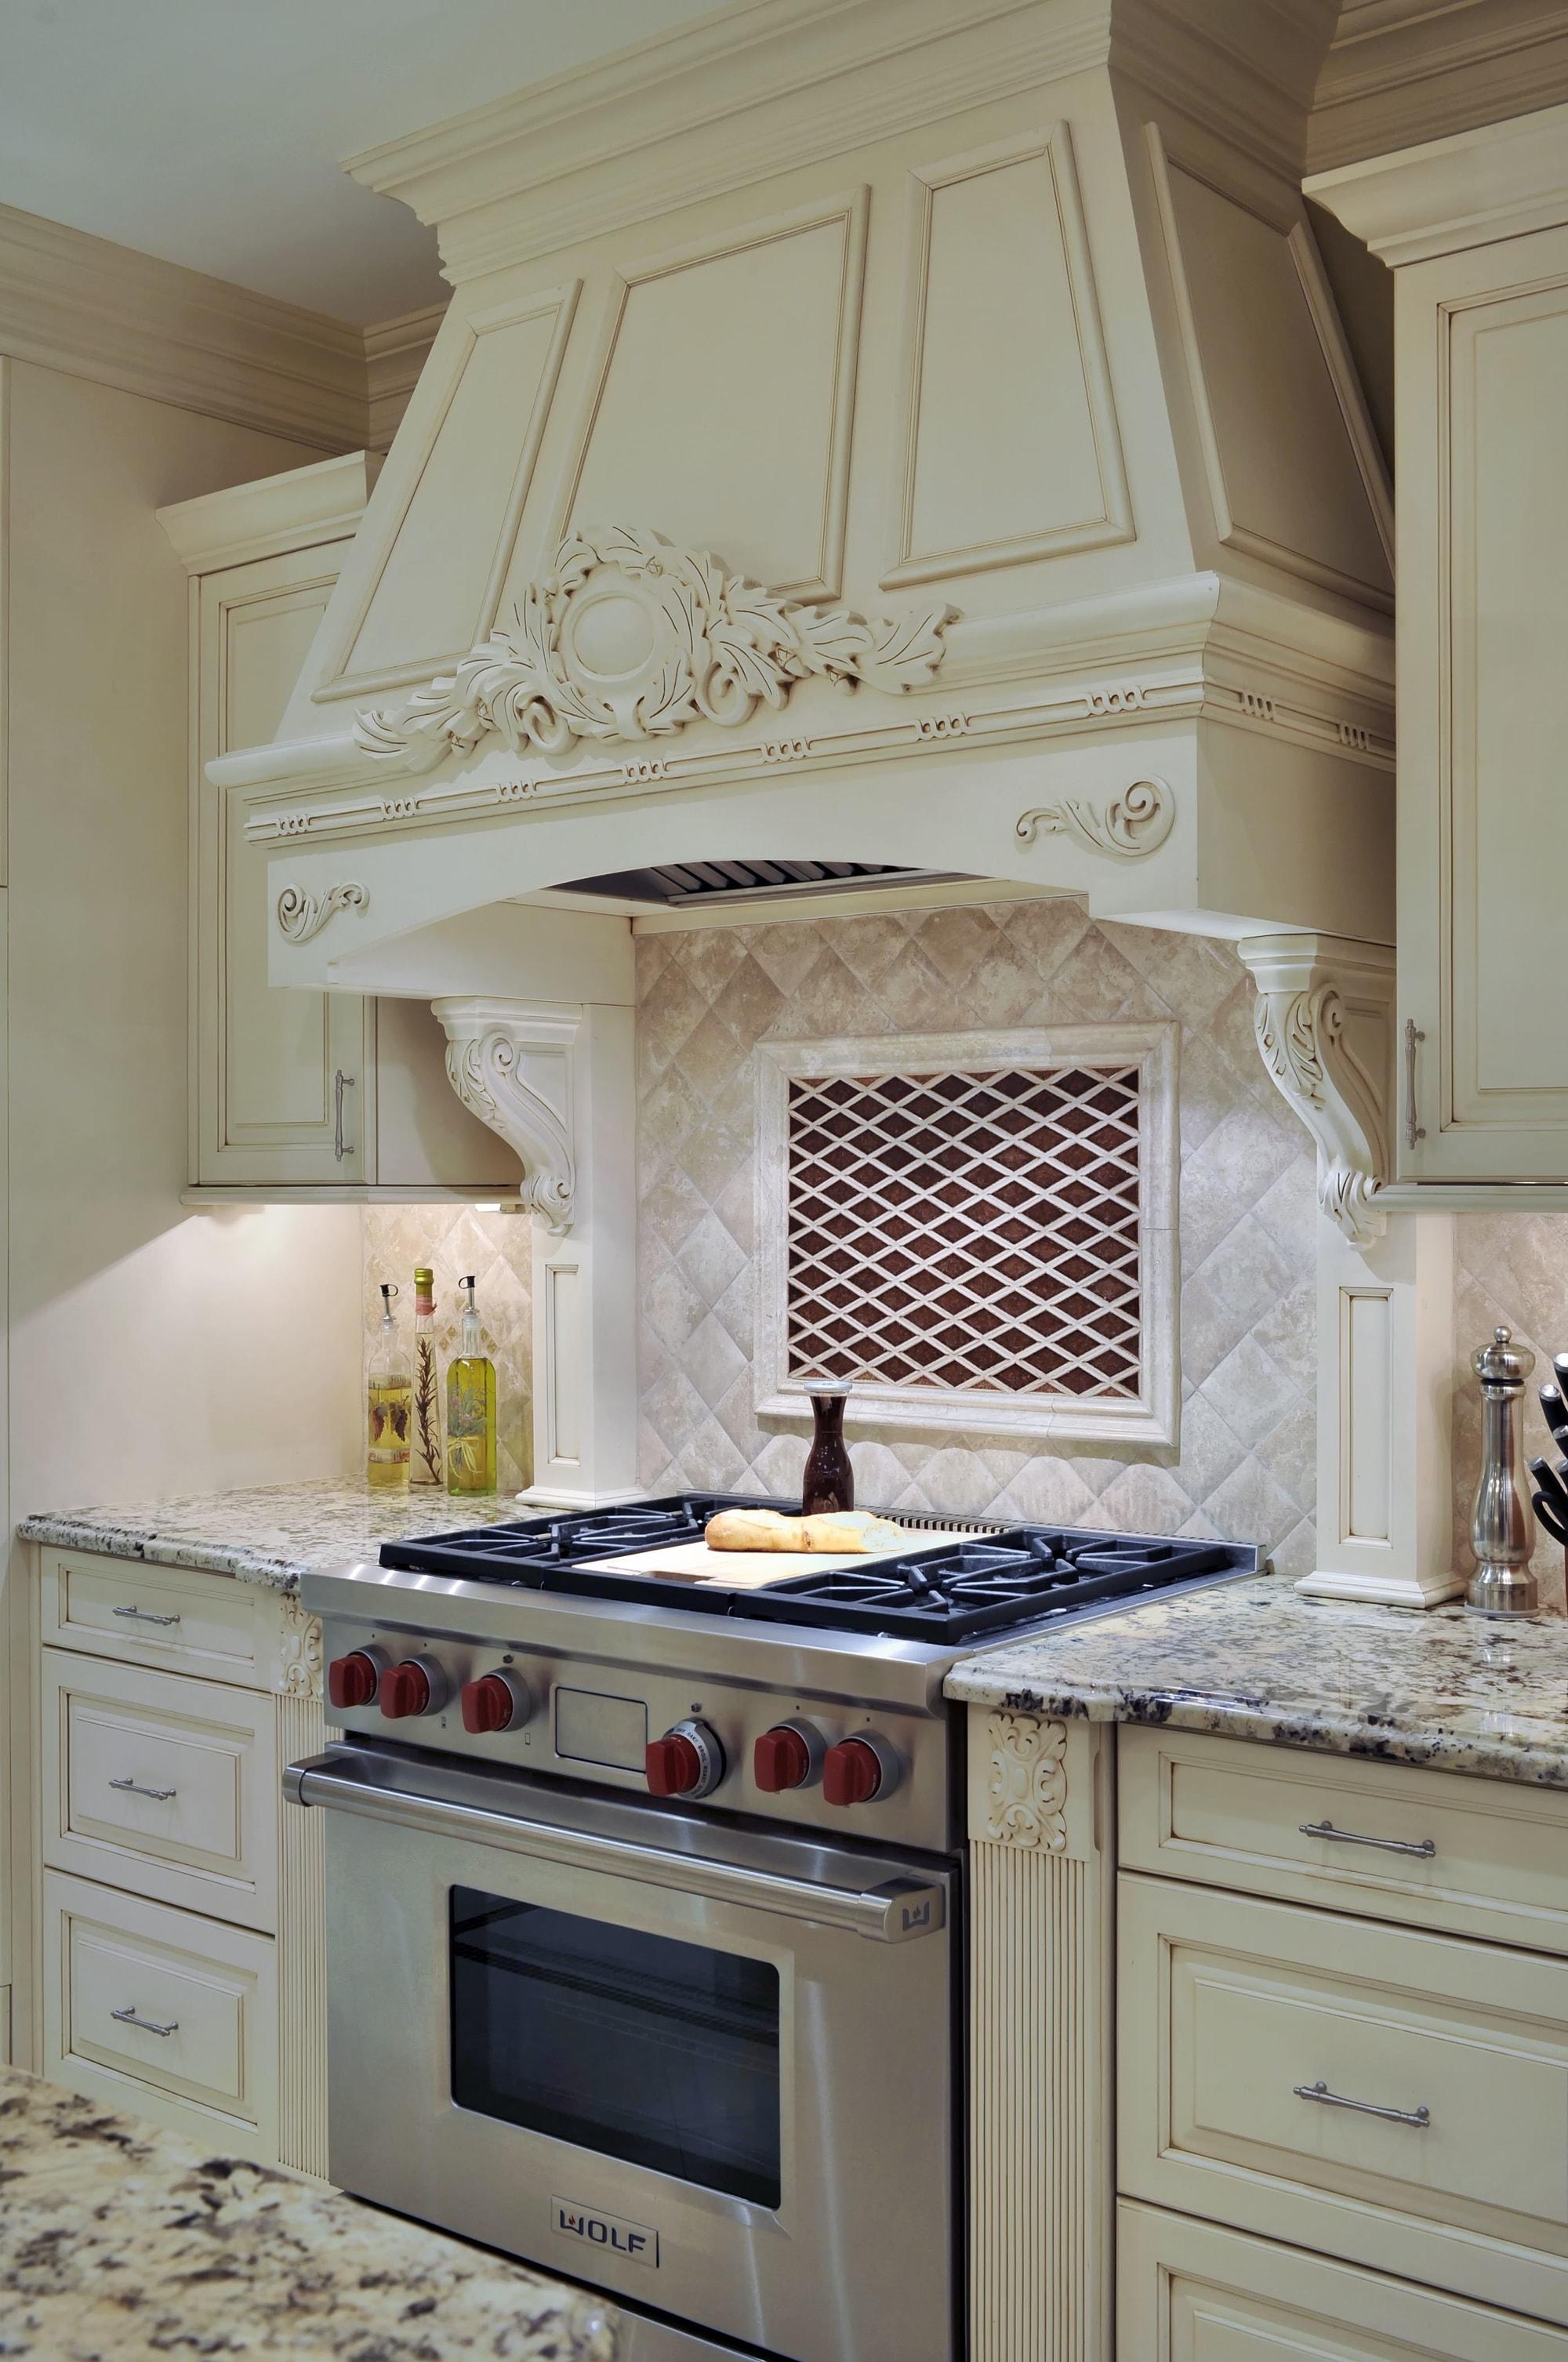 Traditional style kitchen with white backsplash